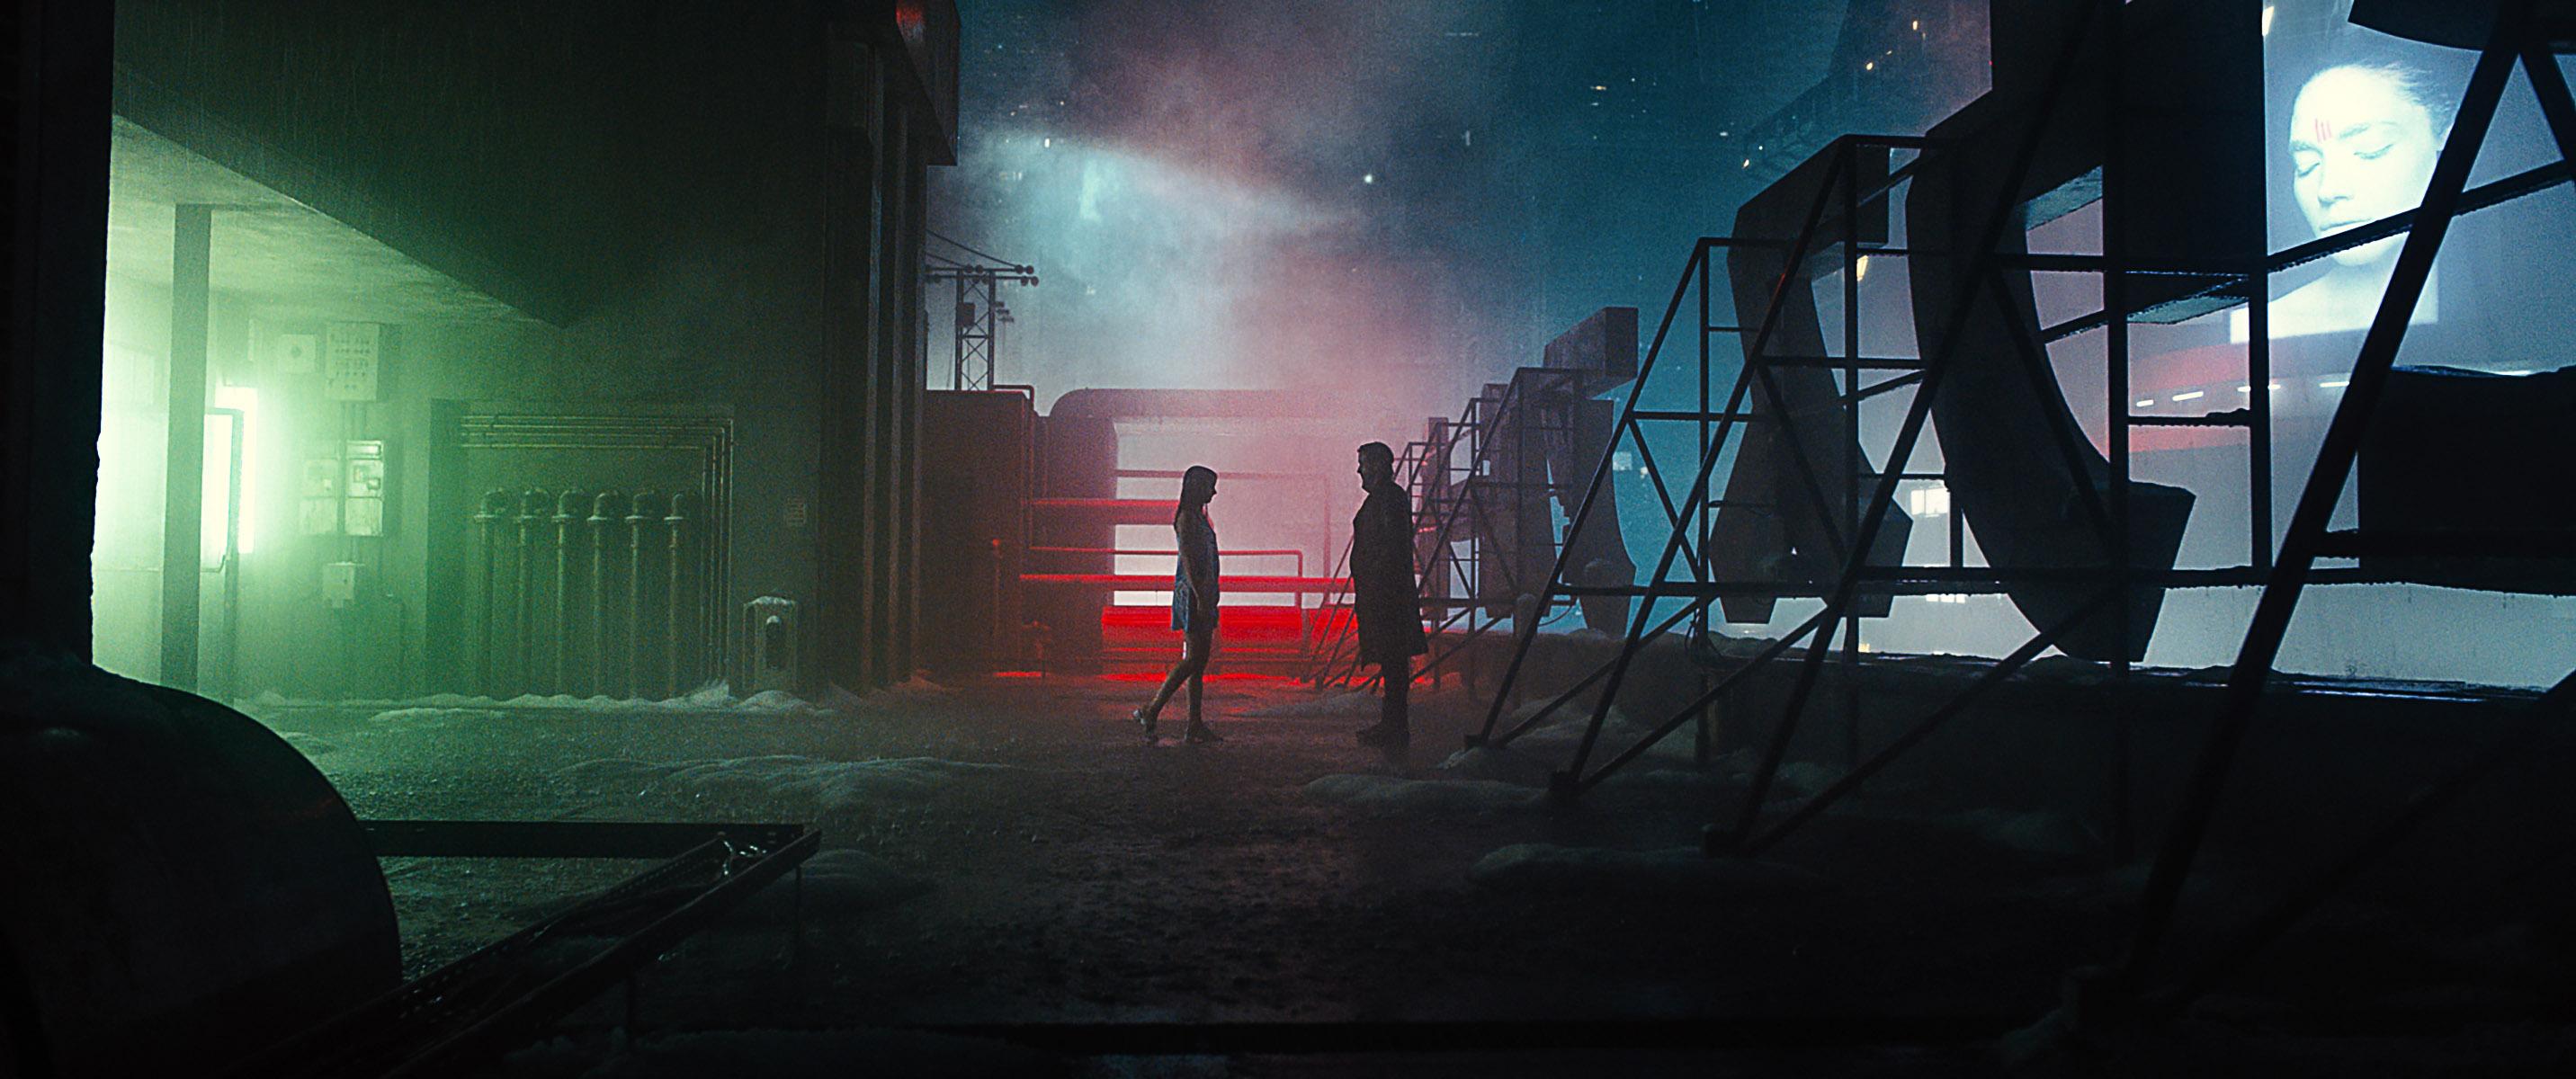 Blade Runner 2049 Hologram Girl Wallpaper Why Roger Deakins Will Finally Win The Best Cinematography